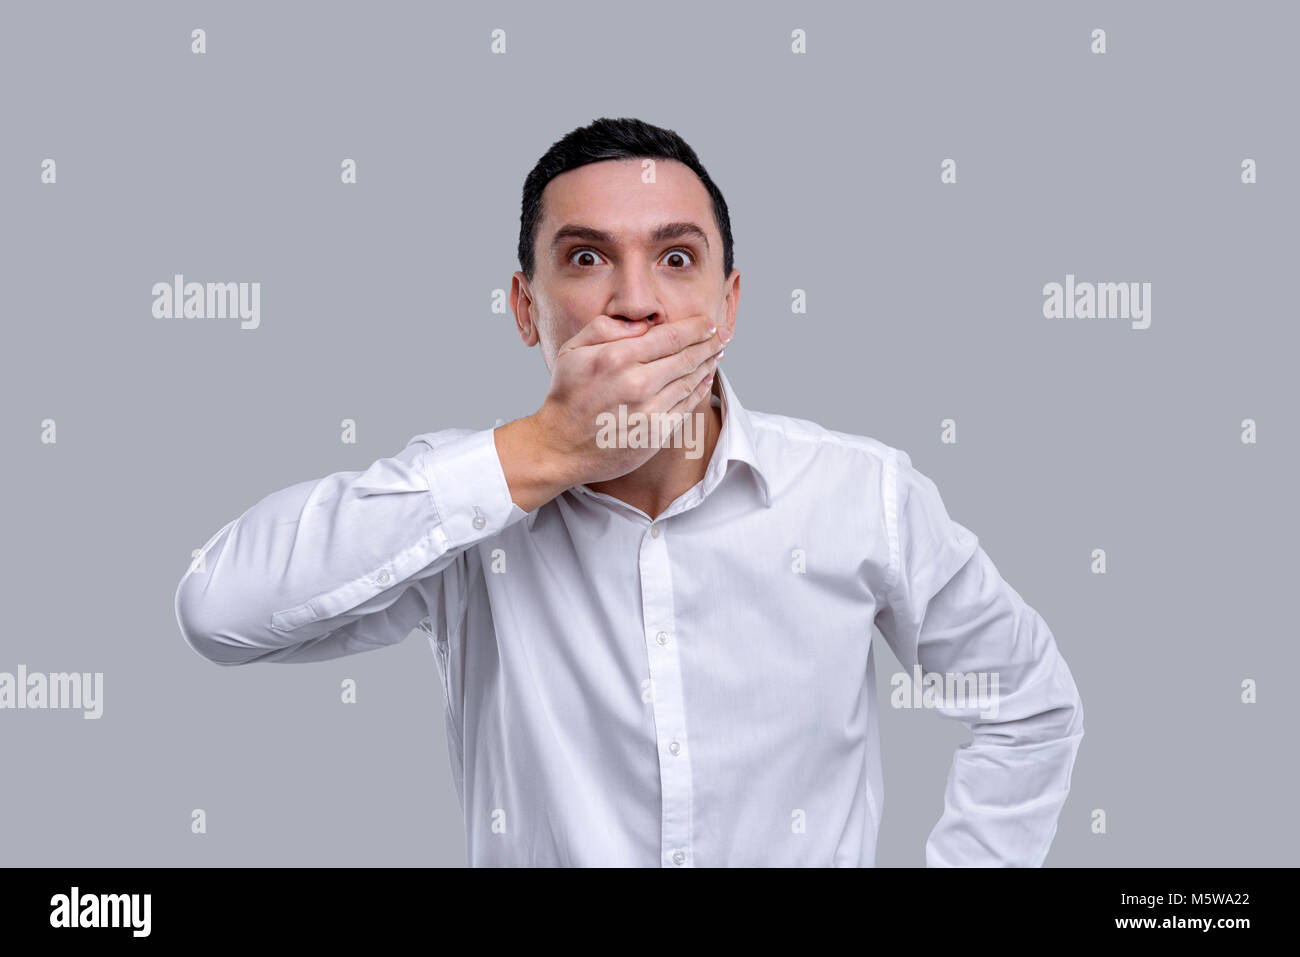 Man Look Surprise Stockfotos & Man Look Surprise Bilder - Alamy